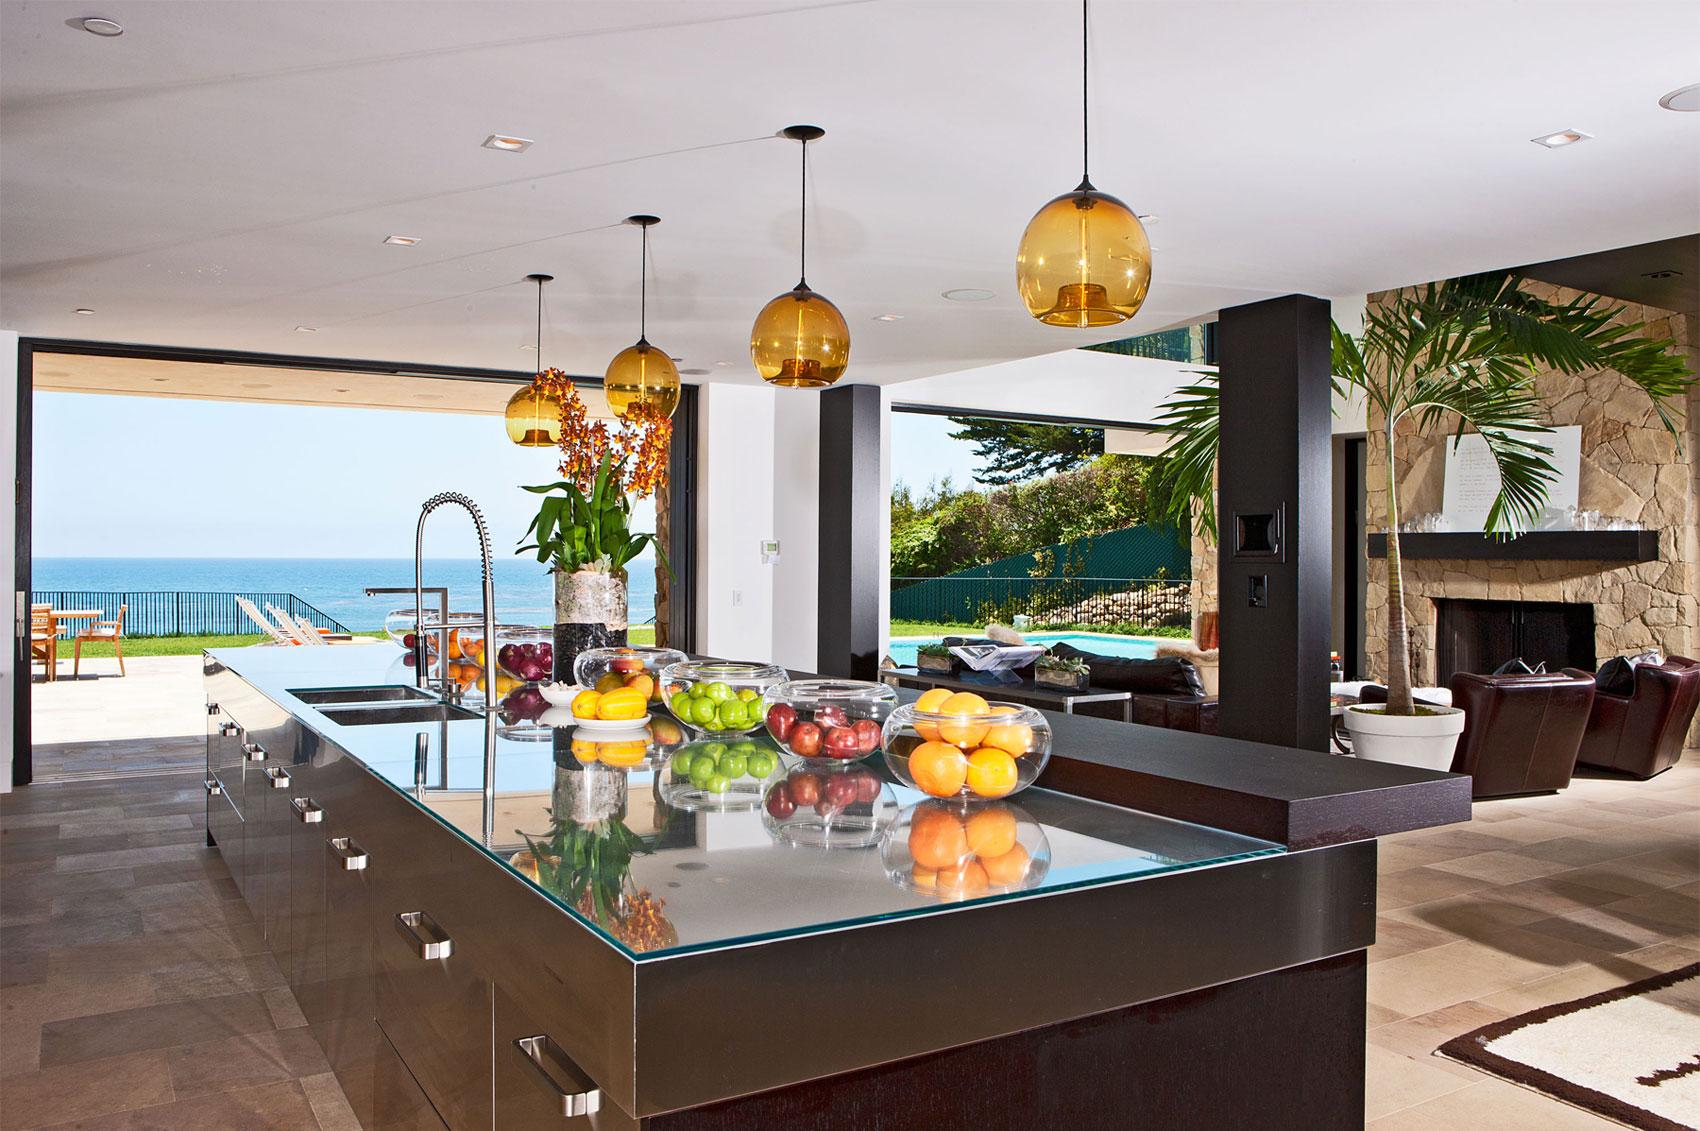 Architecture And Design Kitchen